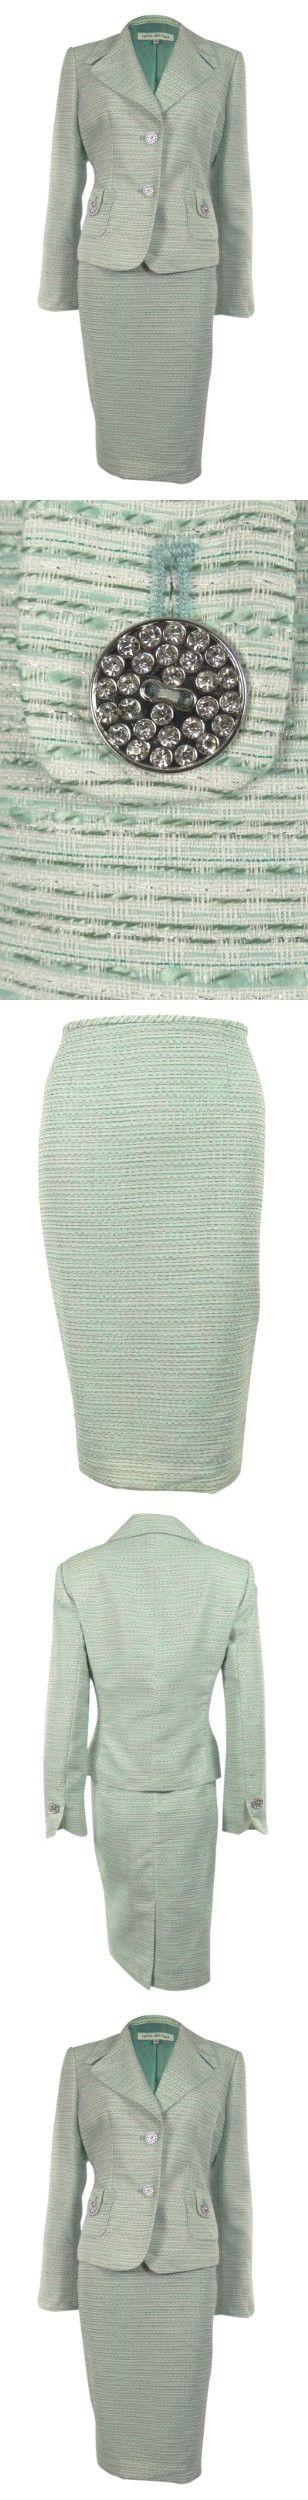 Women's Metallic Fabric Jewel Button Business Suit Skirt Set (14W, Aqua)